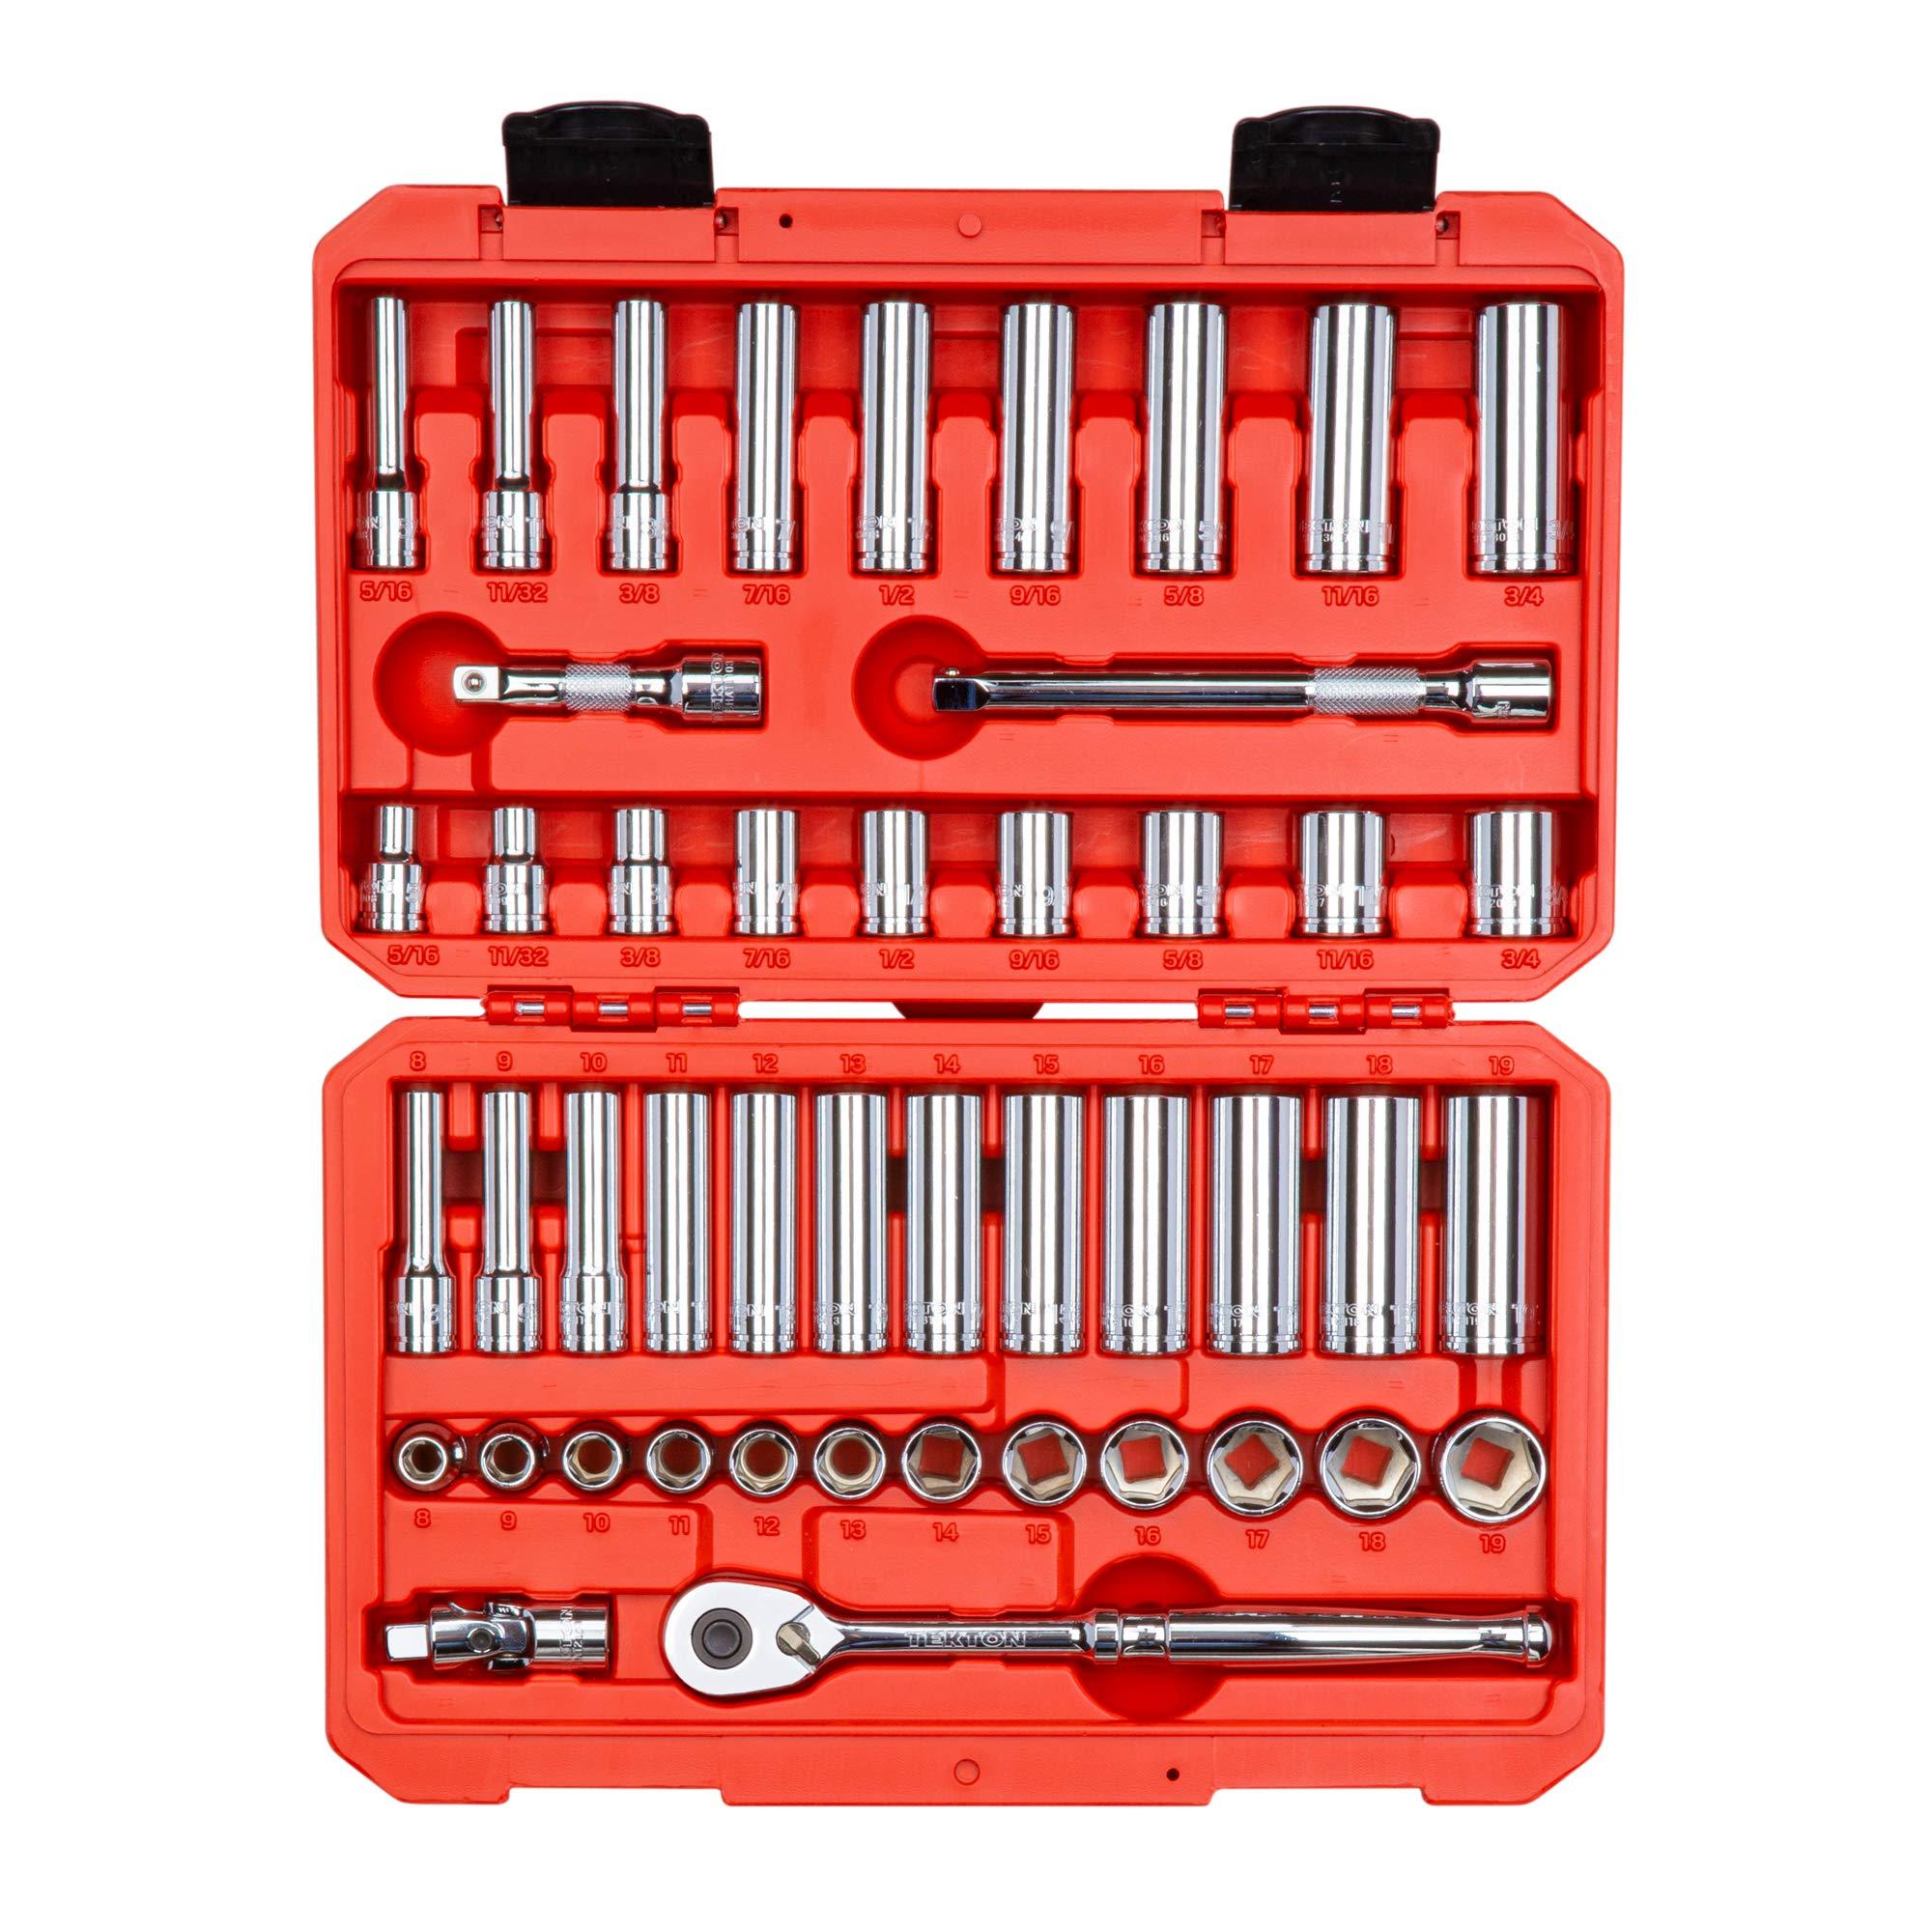 TEKTON 3/8-Inch Drive 6-Point Socket & Ratchet Set, Inch/Metric, 5/16-Inch - 3/4-Inch, 8 mm - 19 mm, 47-Piece (Case)   SKT15301